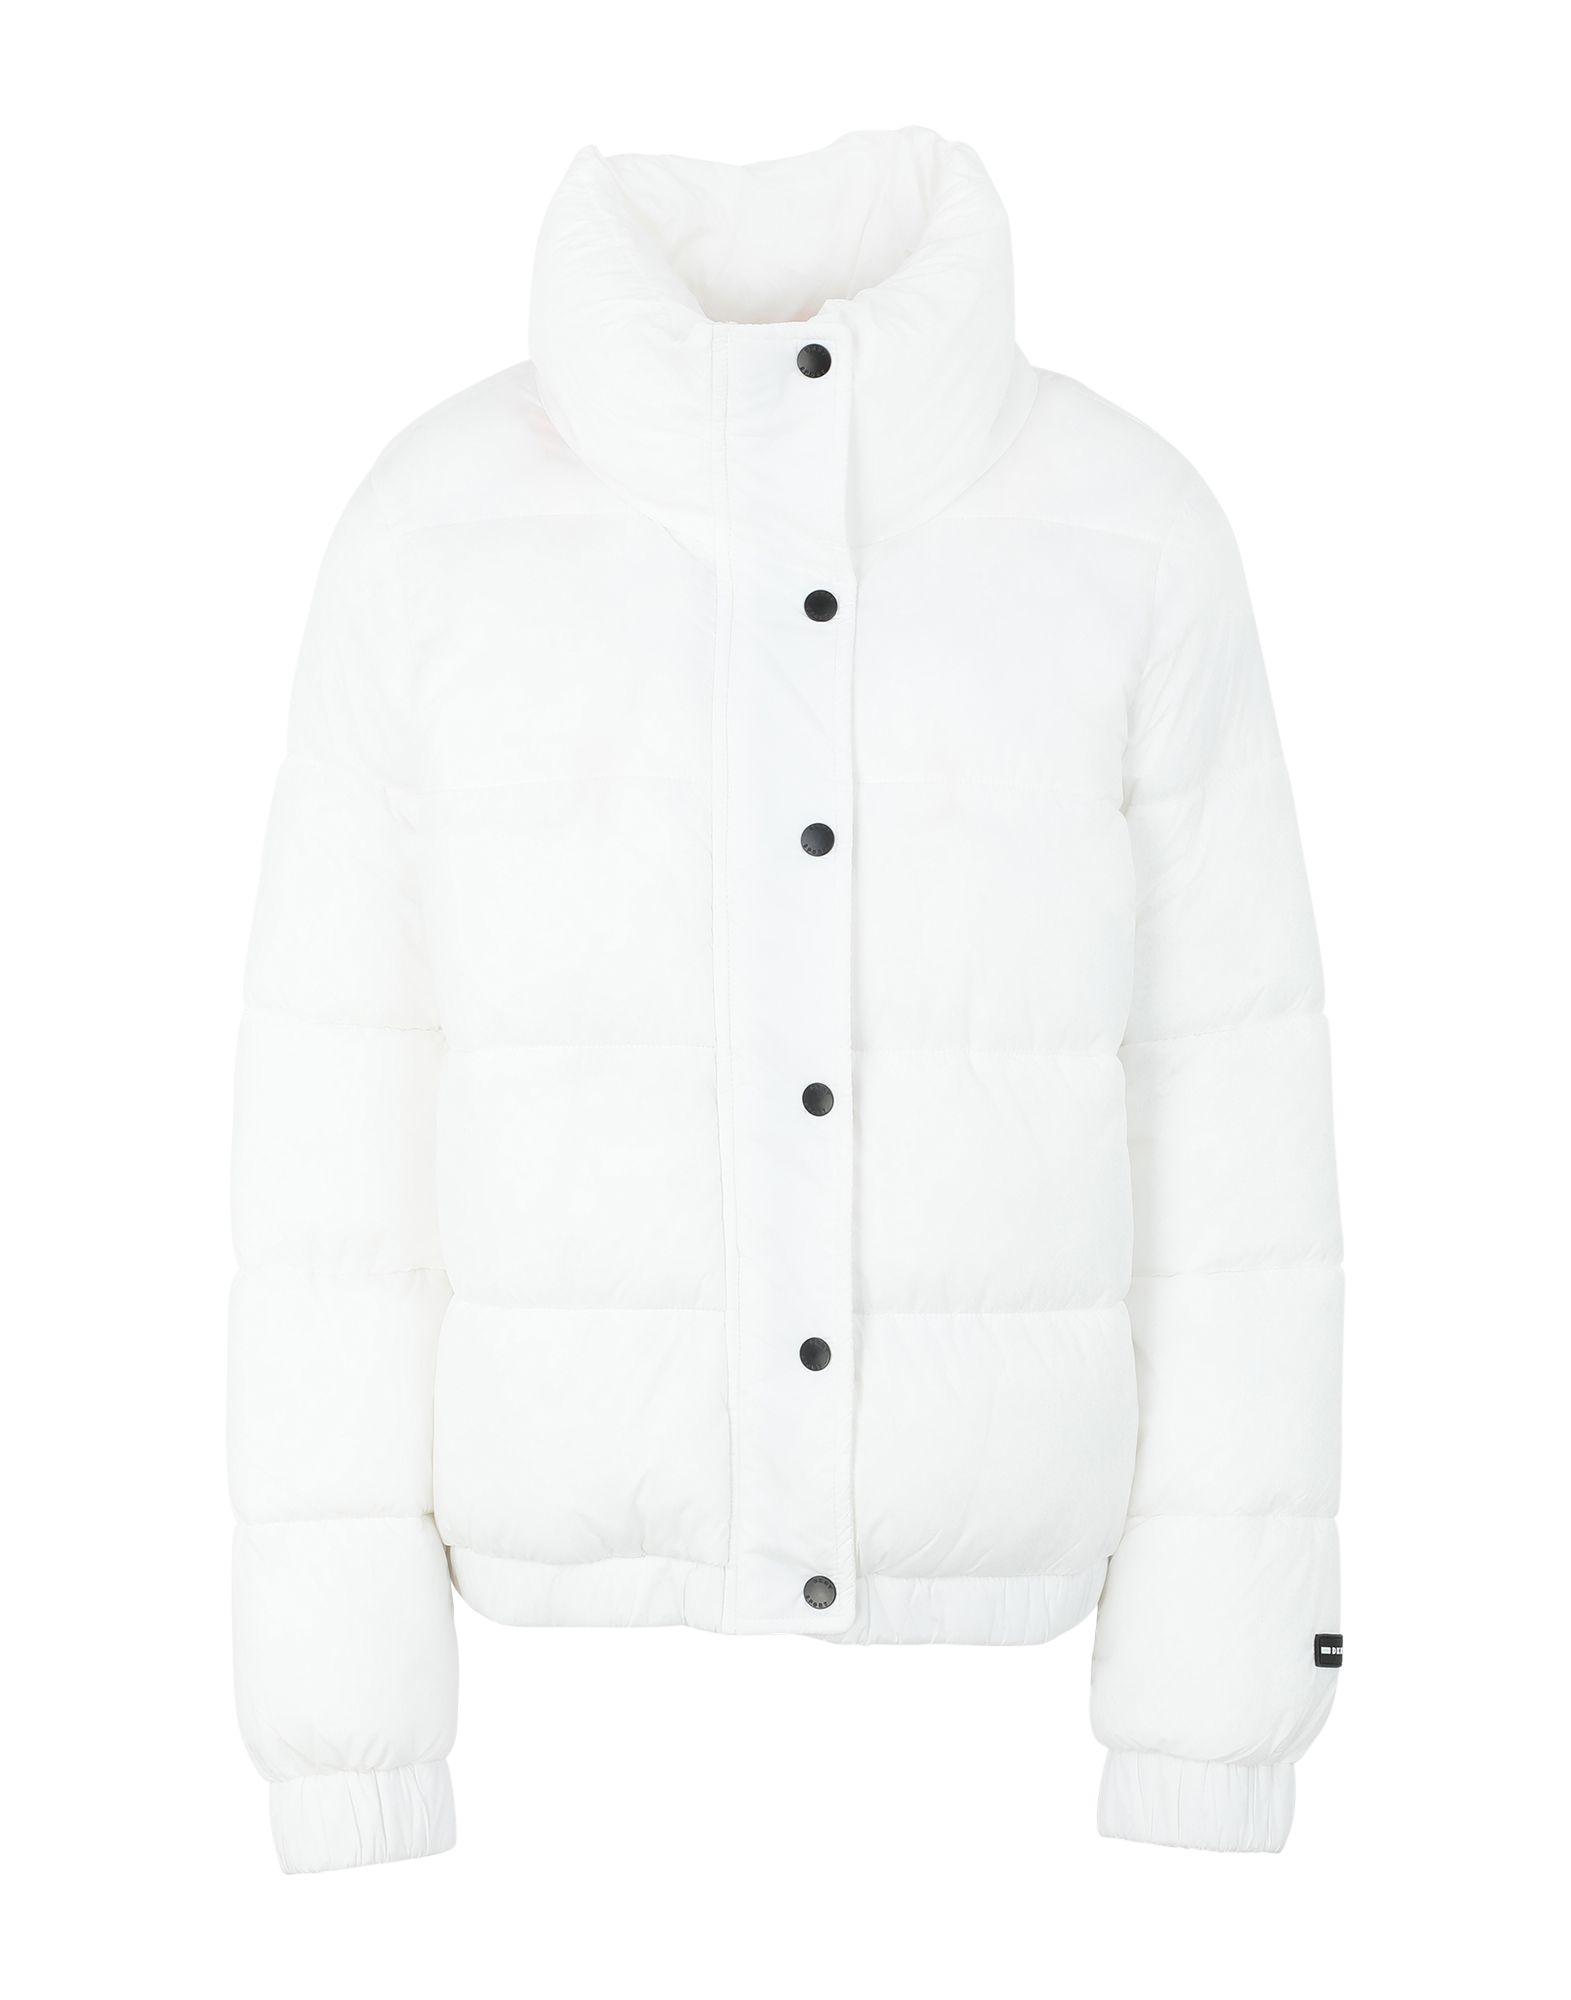 YOOX.COM(ユークス)《セール開催中》DKNY レディース 合成繊維中綿アウター ホワイト L ナイロン 100% LOGO PUFFER